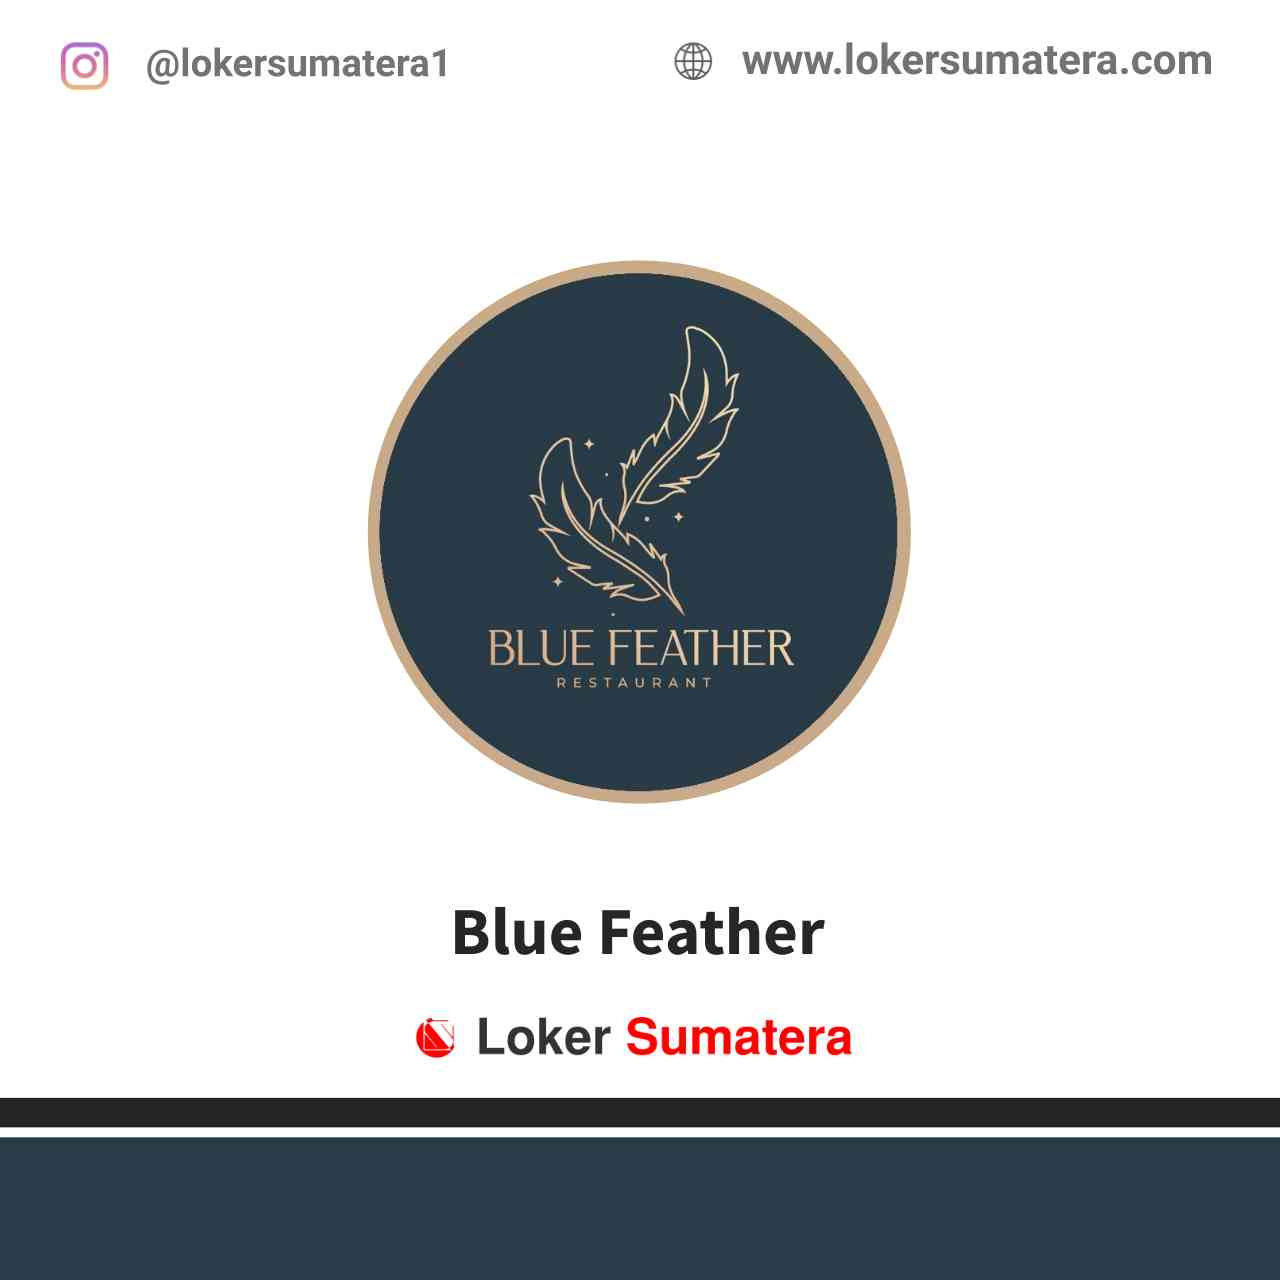 Blue Feather Pekanbaru